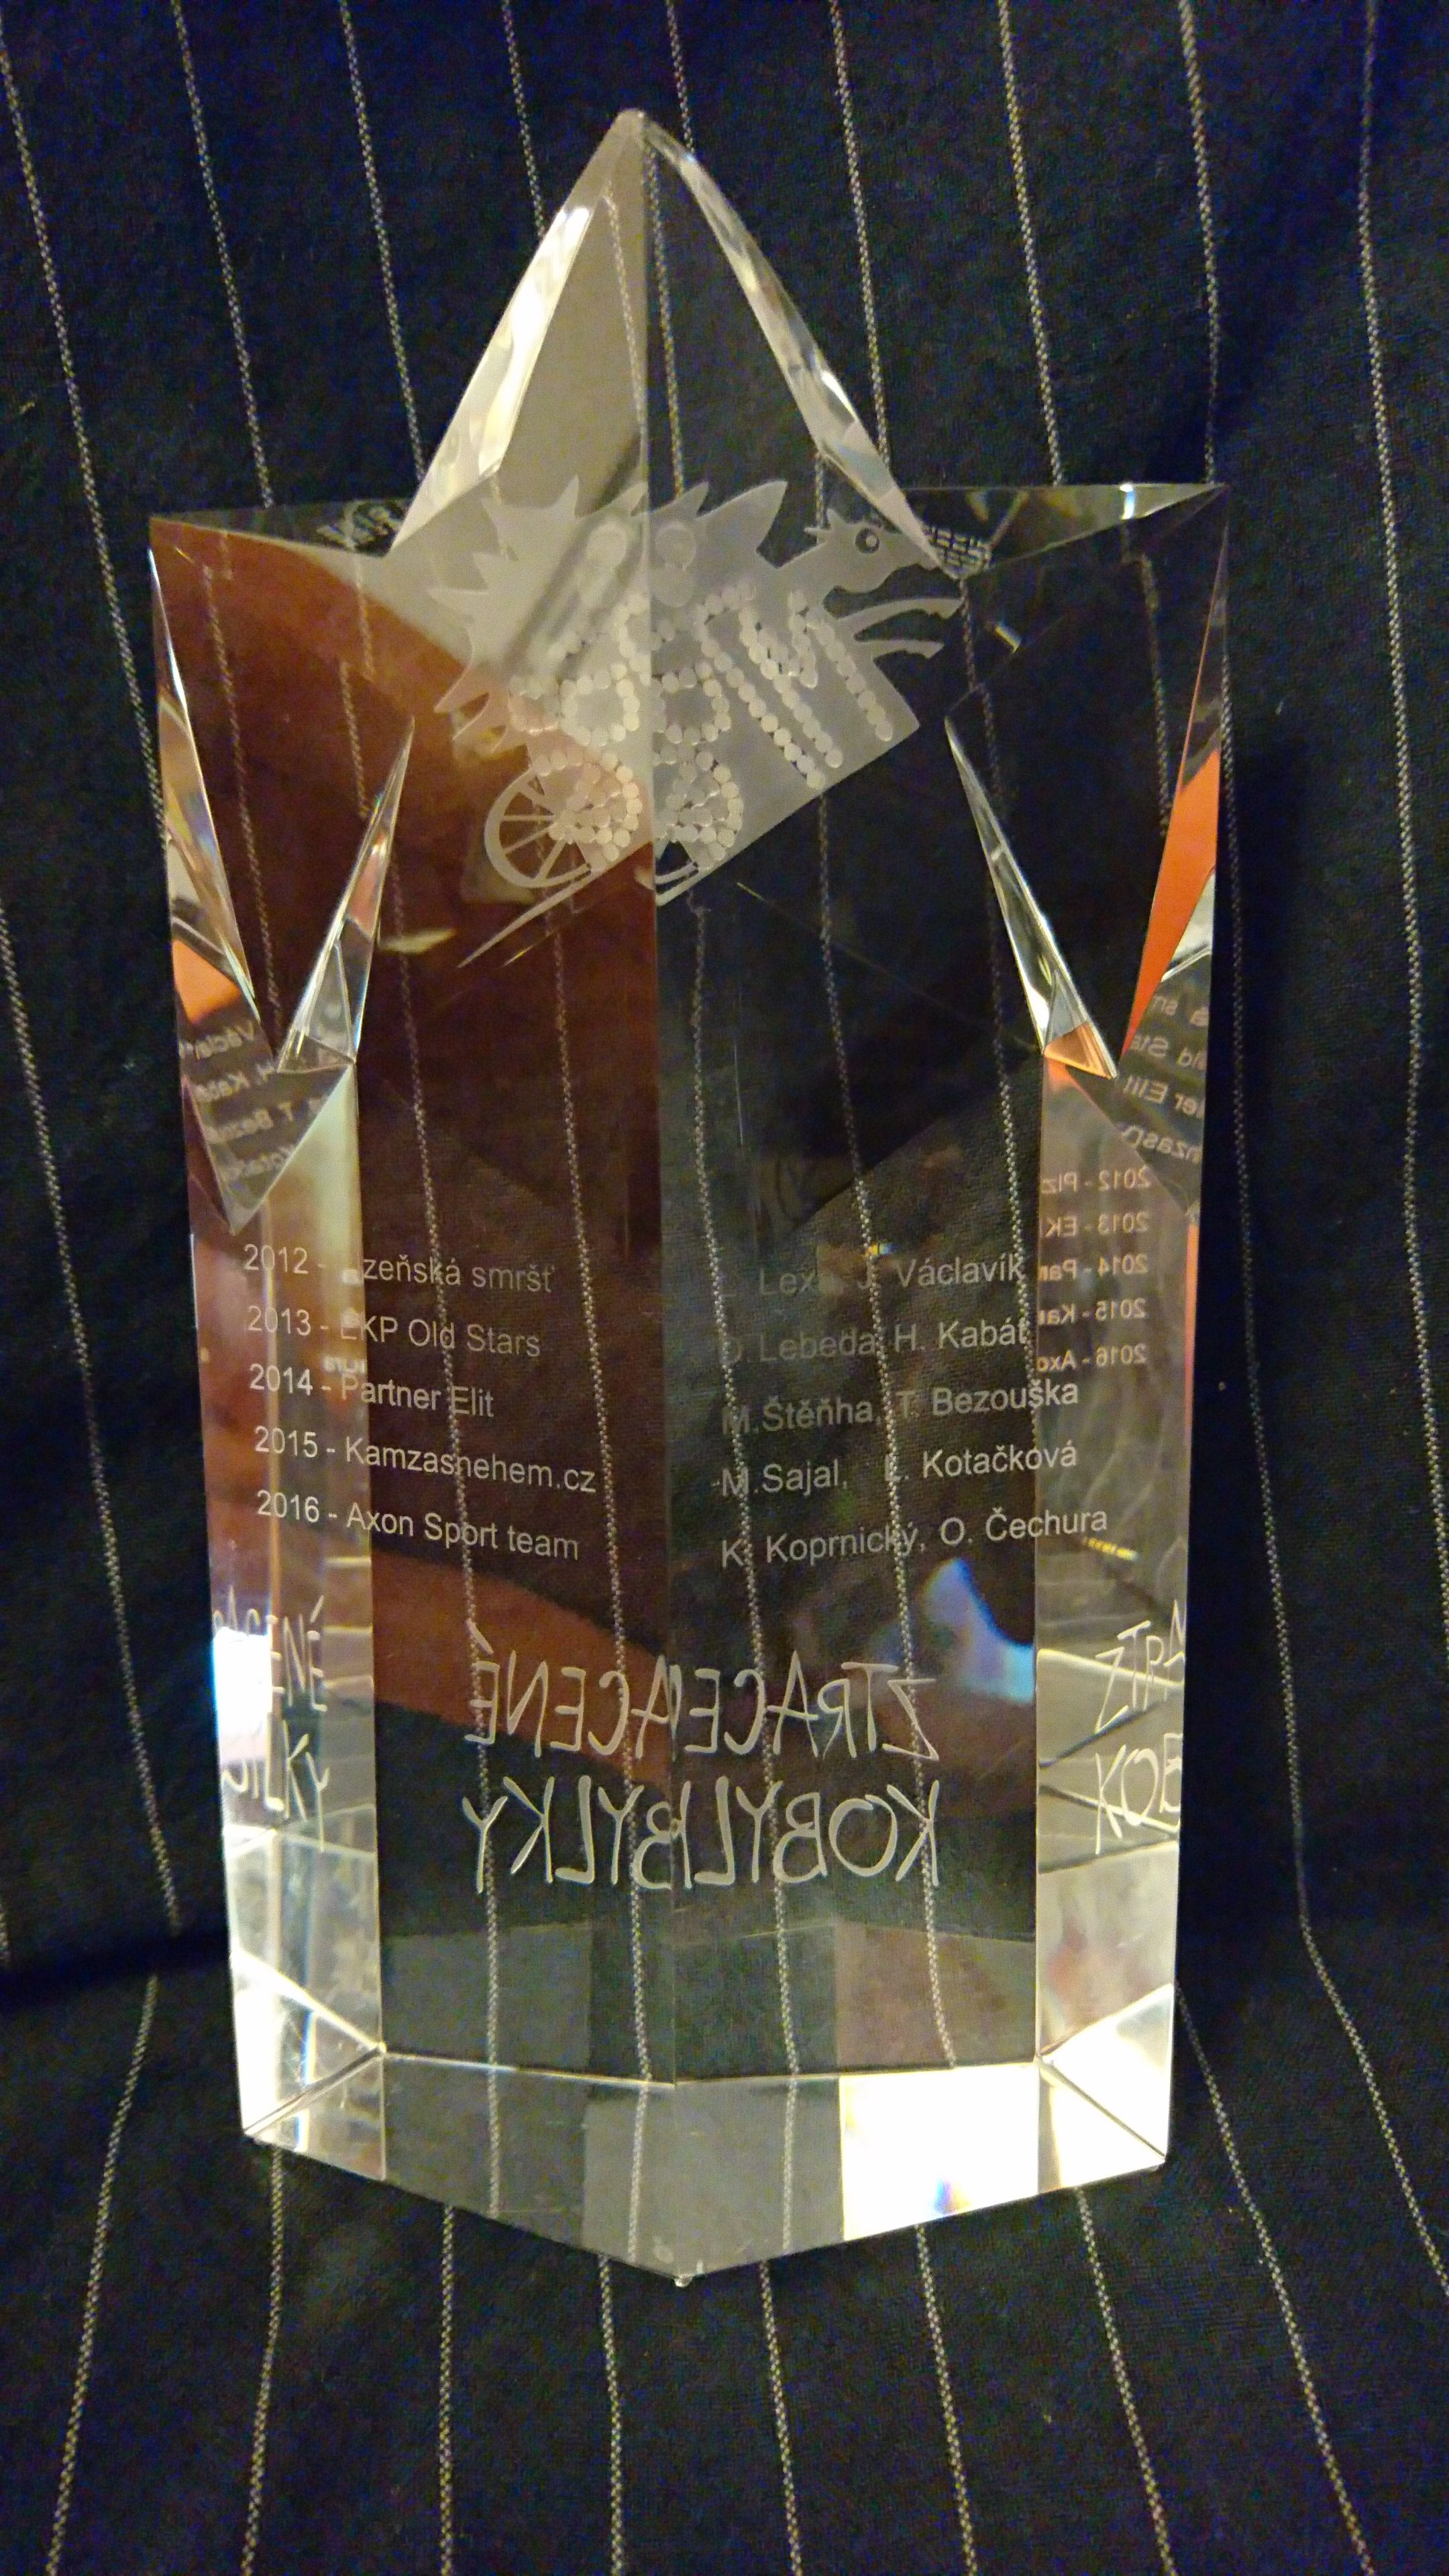 g160725002-kobylkopohar-vitezove-za-rocniky-2012-2016